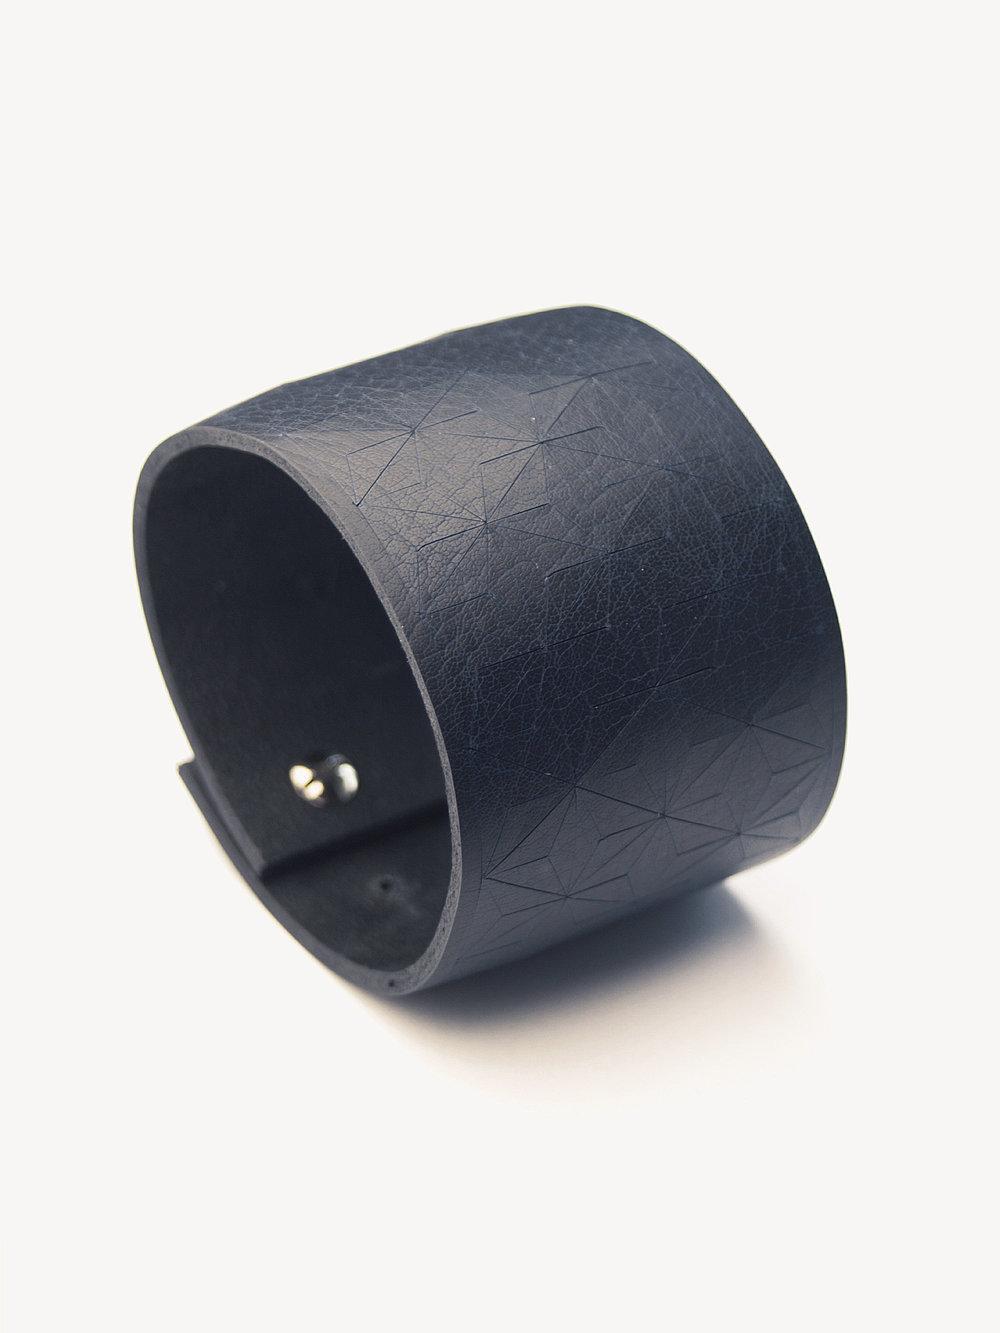 Leder-Armband, breit in dunkelblau/ Leather bracelet, big in navy